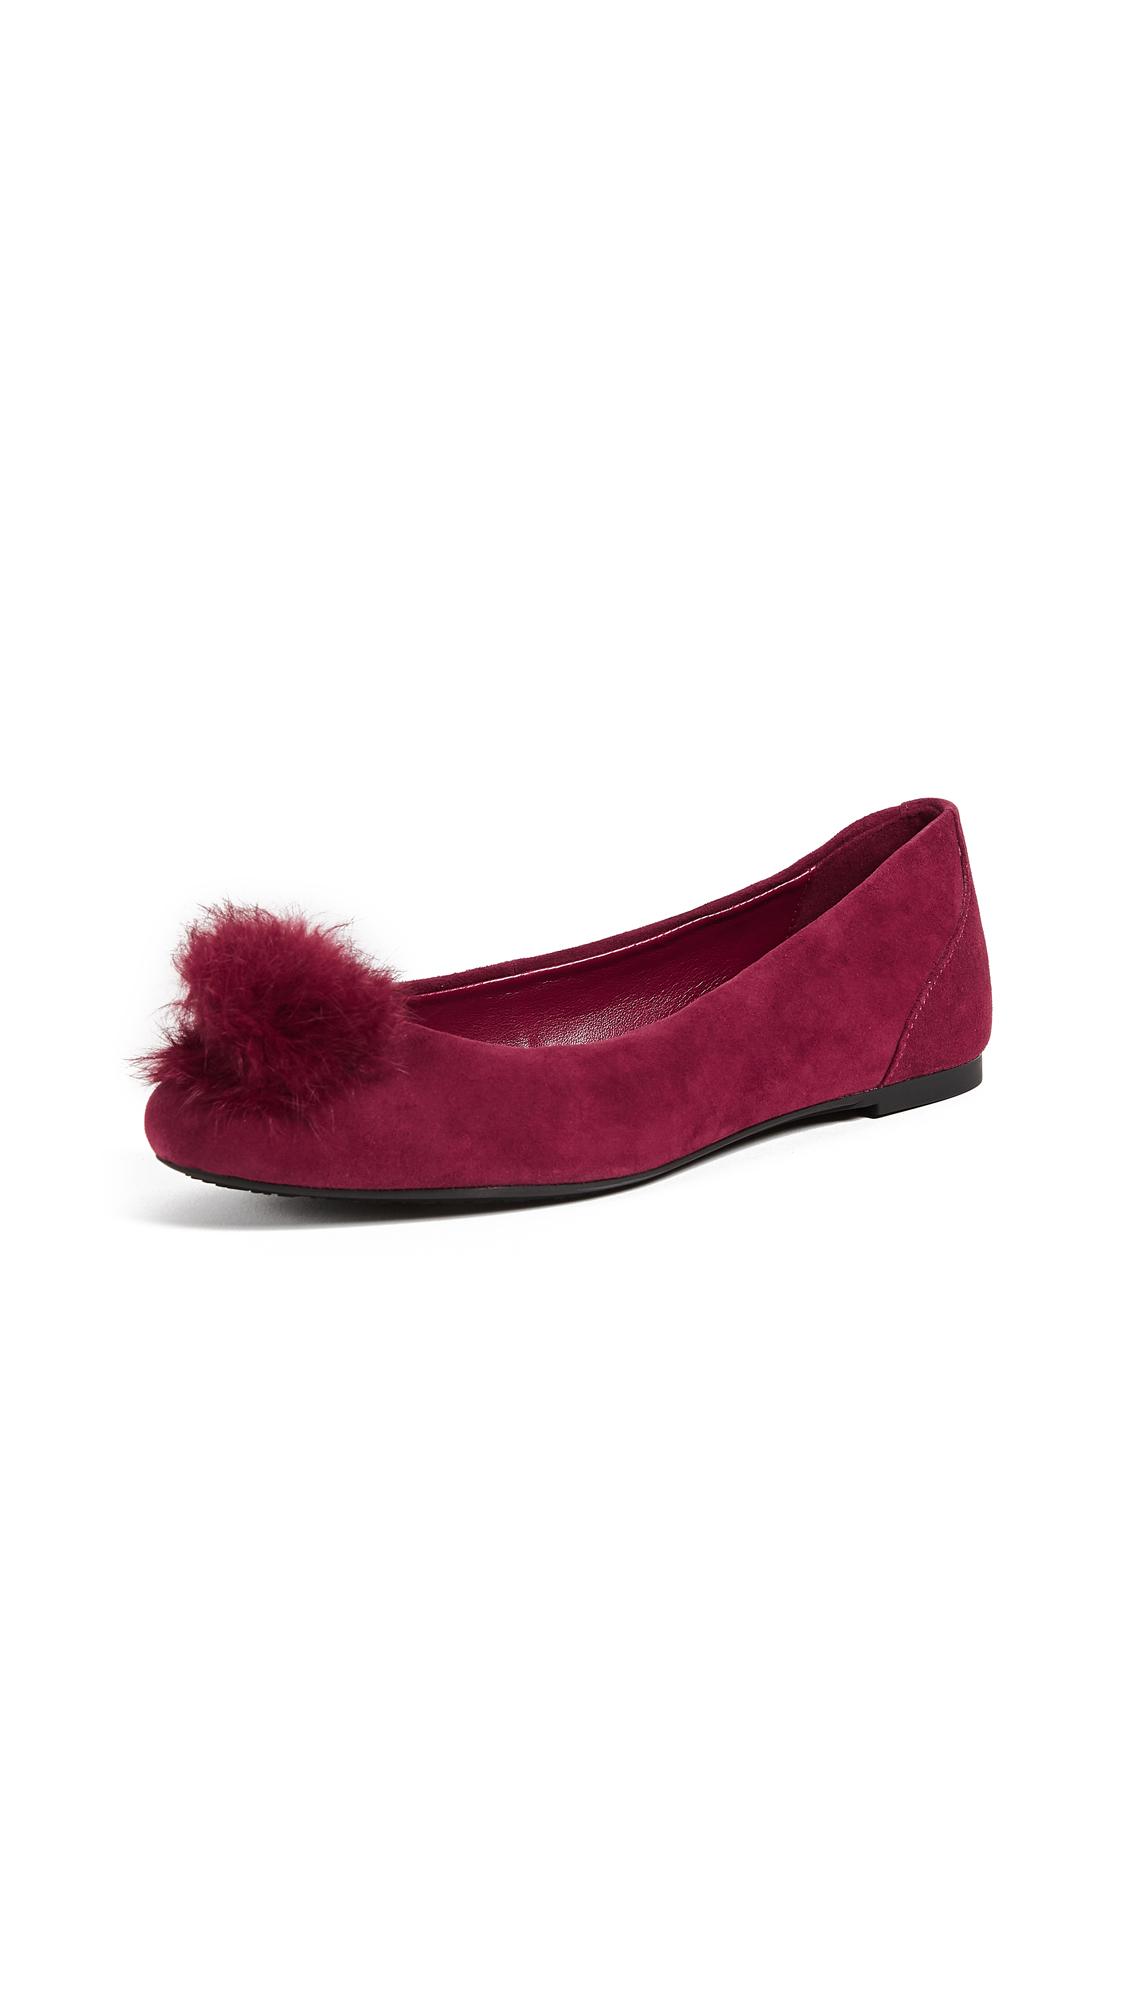 MICHAEL Michael Kors Remi Fur Pom Ballet Flats - Mulberry